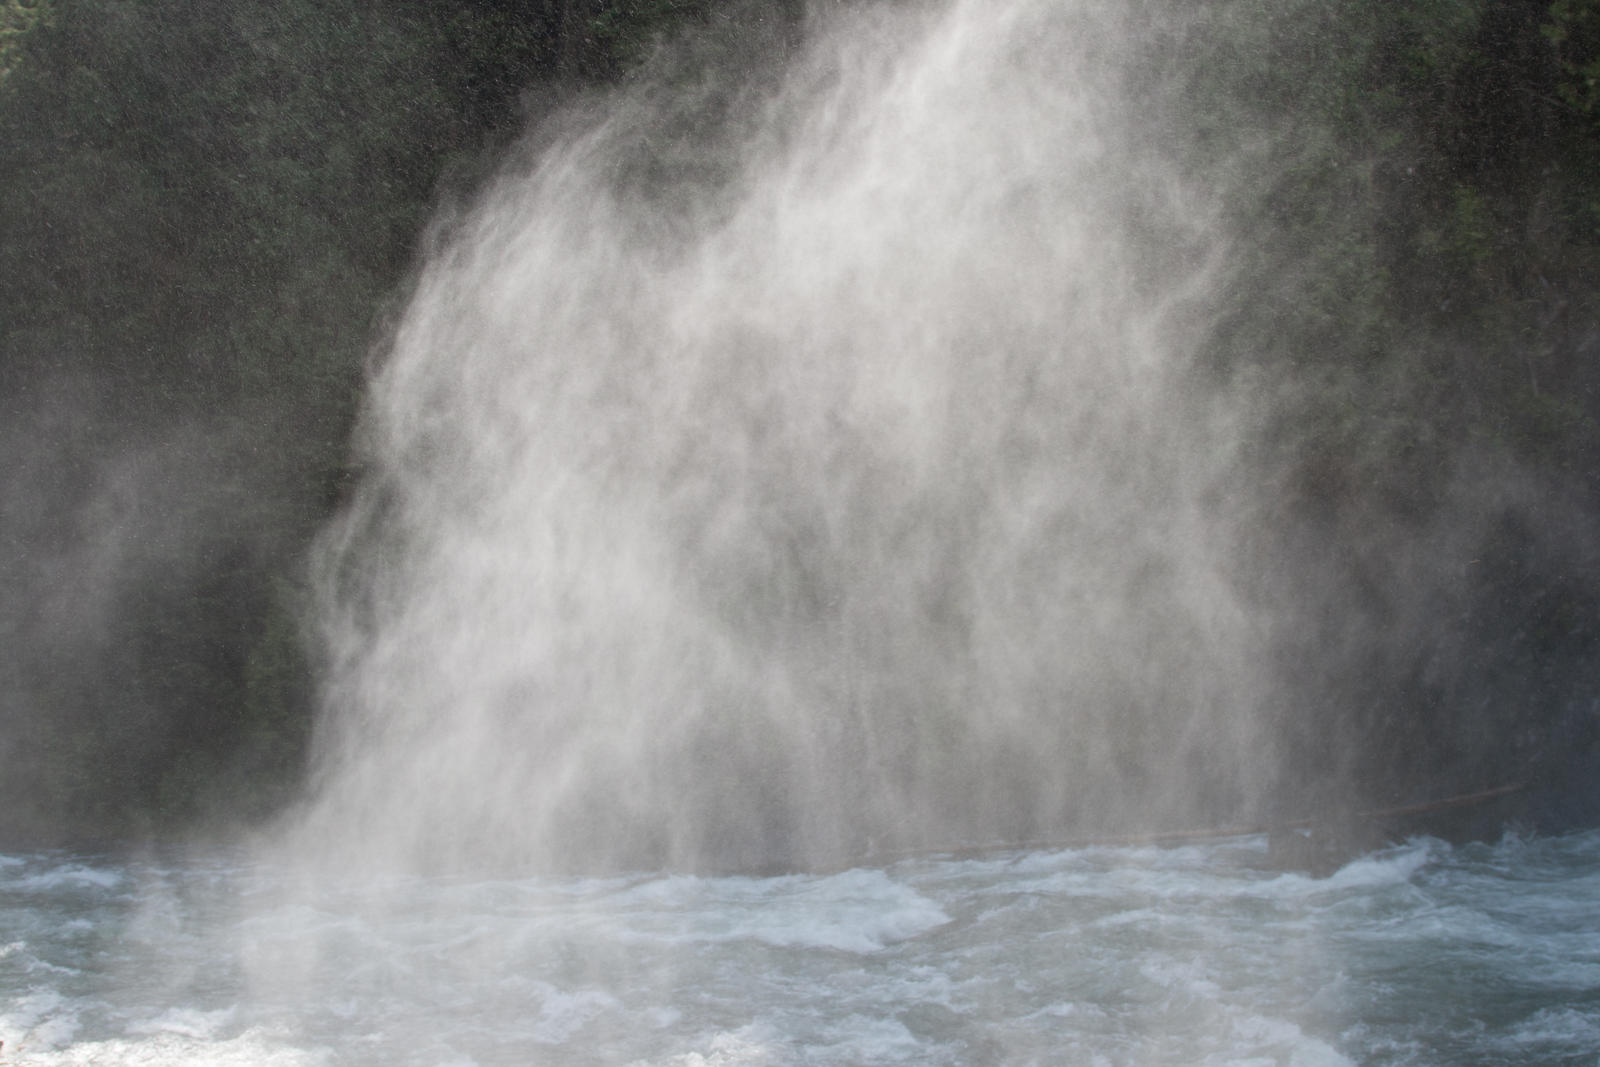 Leeorr - Mist Texture by leeorr-stock